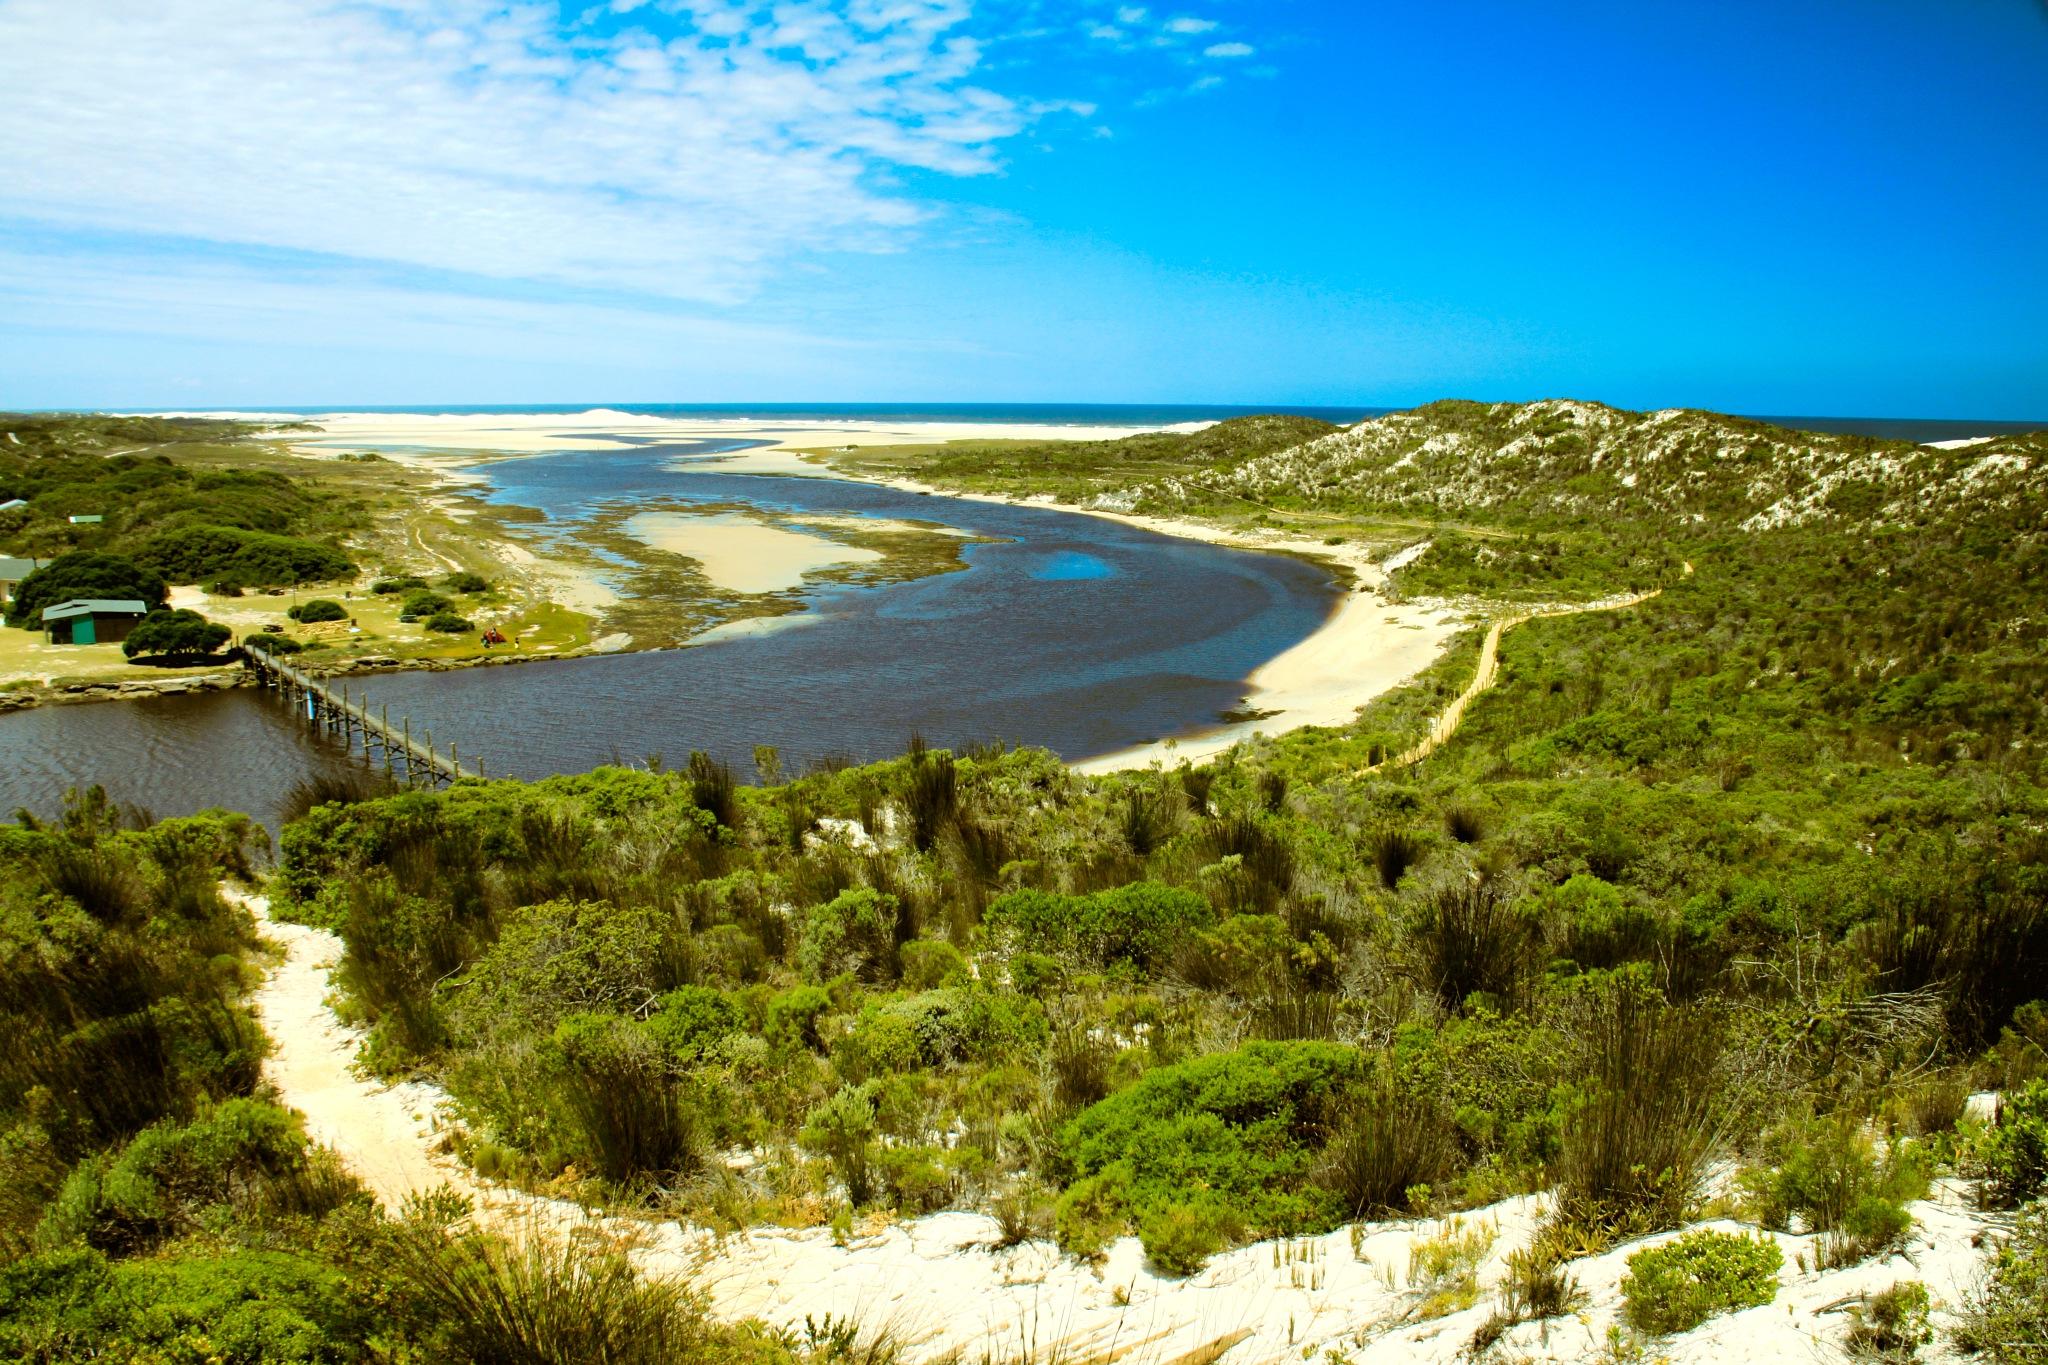 Estuary by Nauta Piscatorque